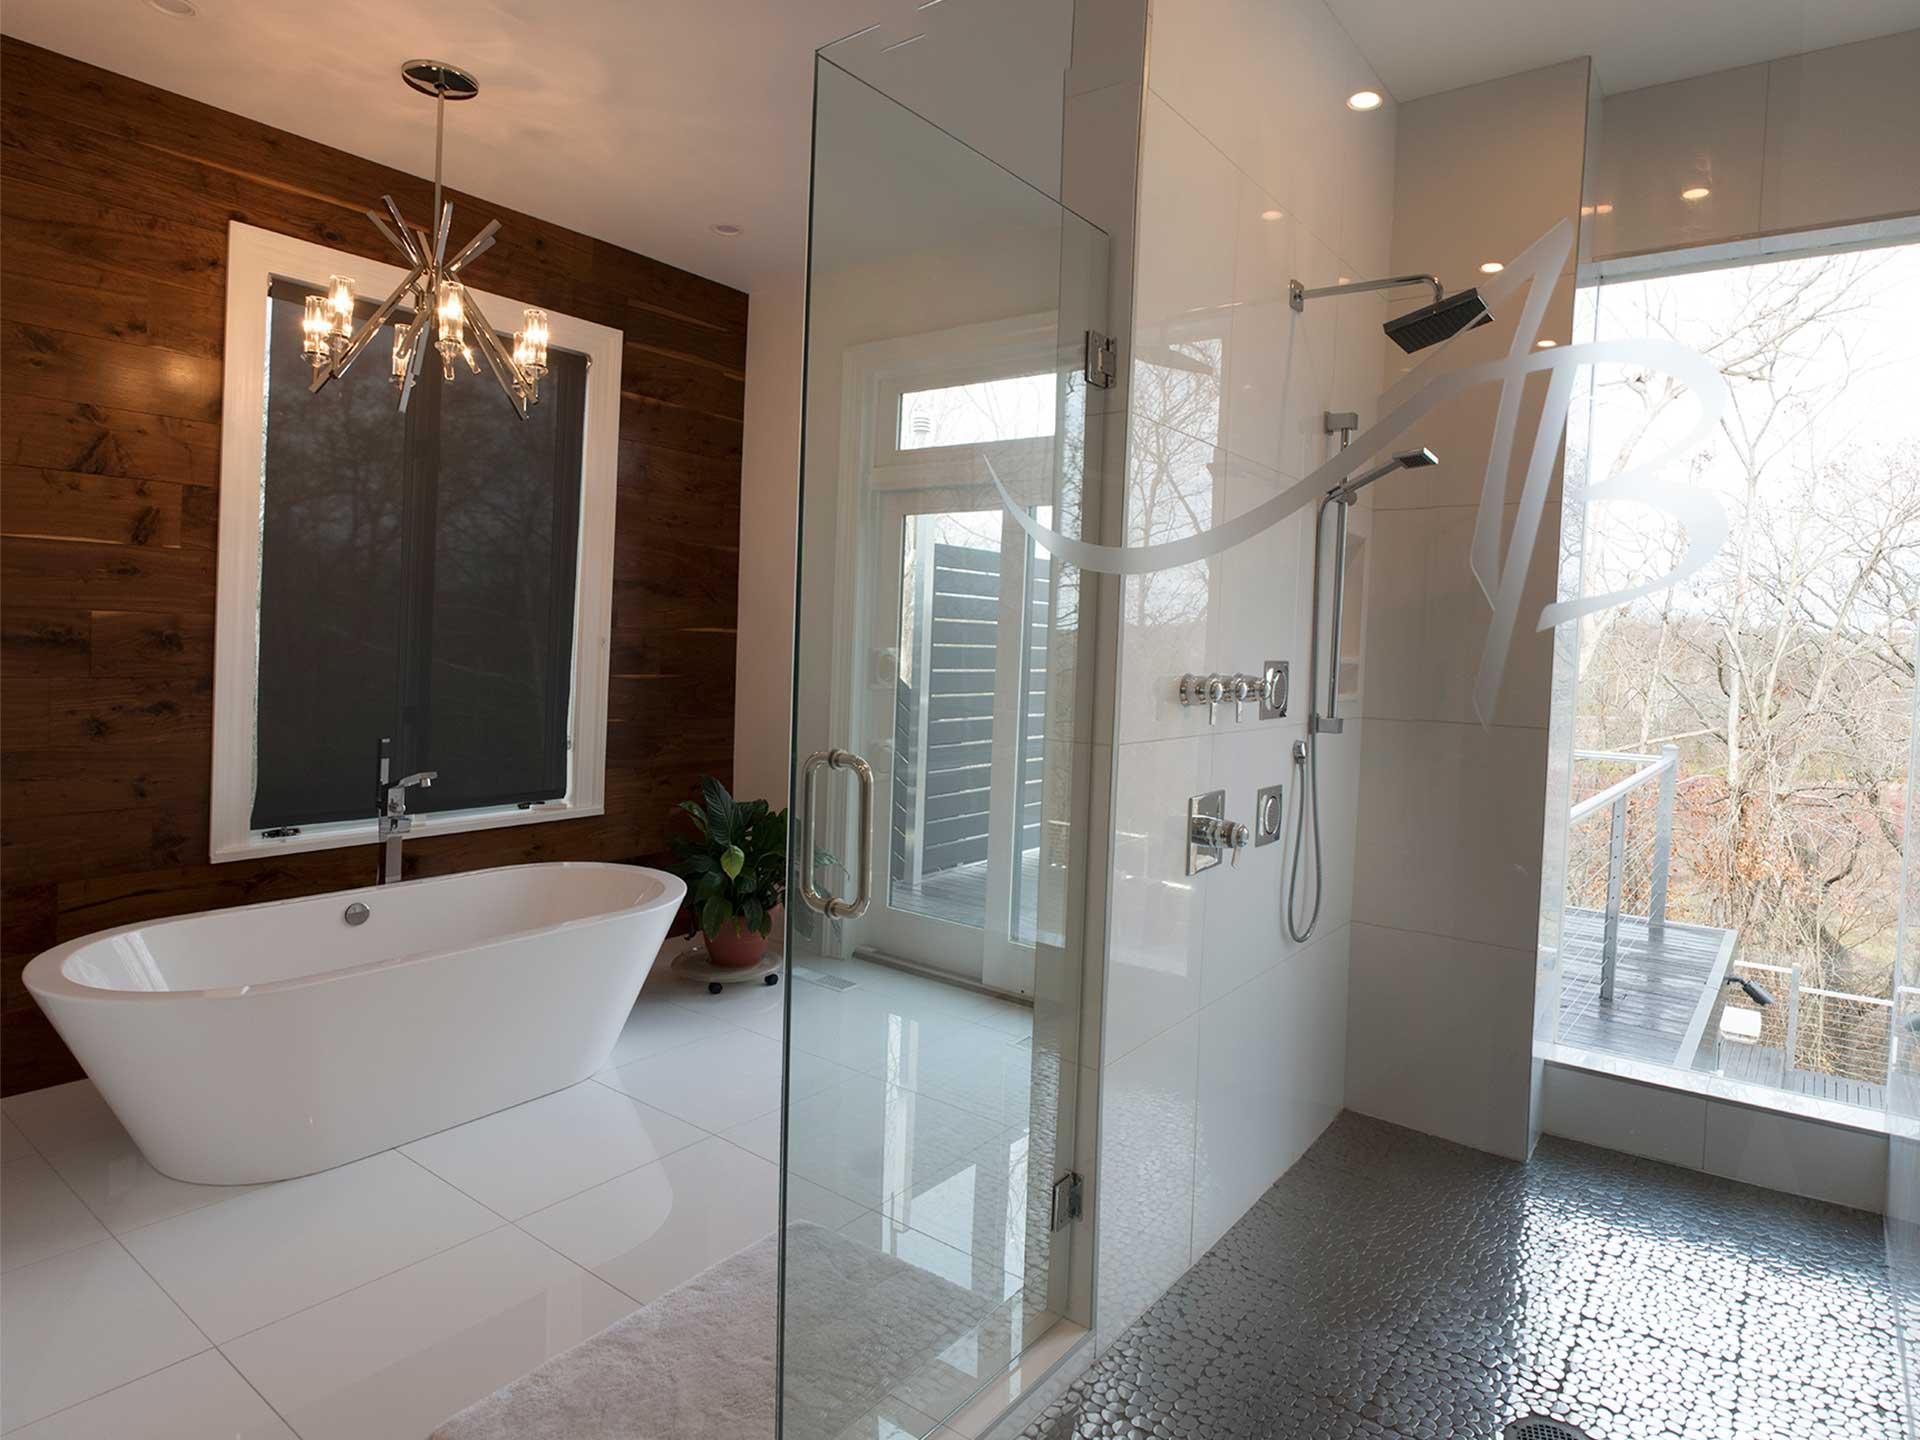 midwest-remodeling-bathroom-remodel